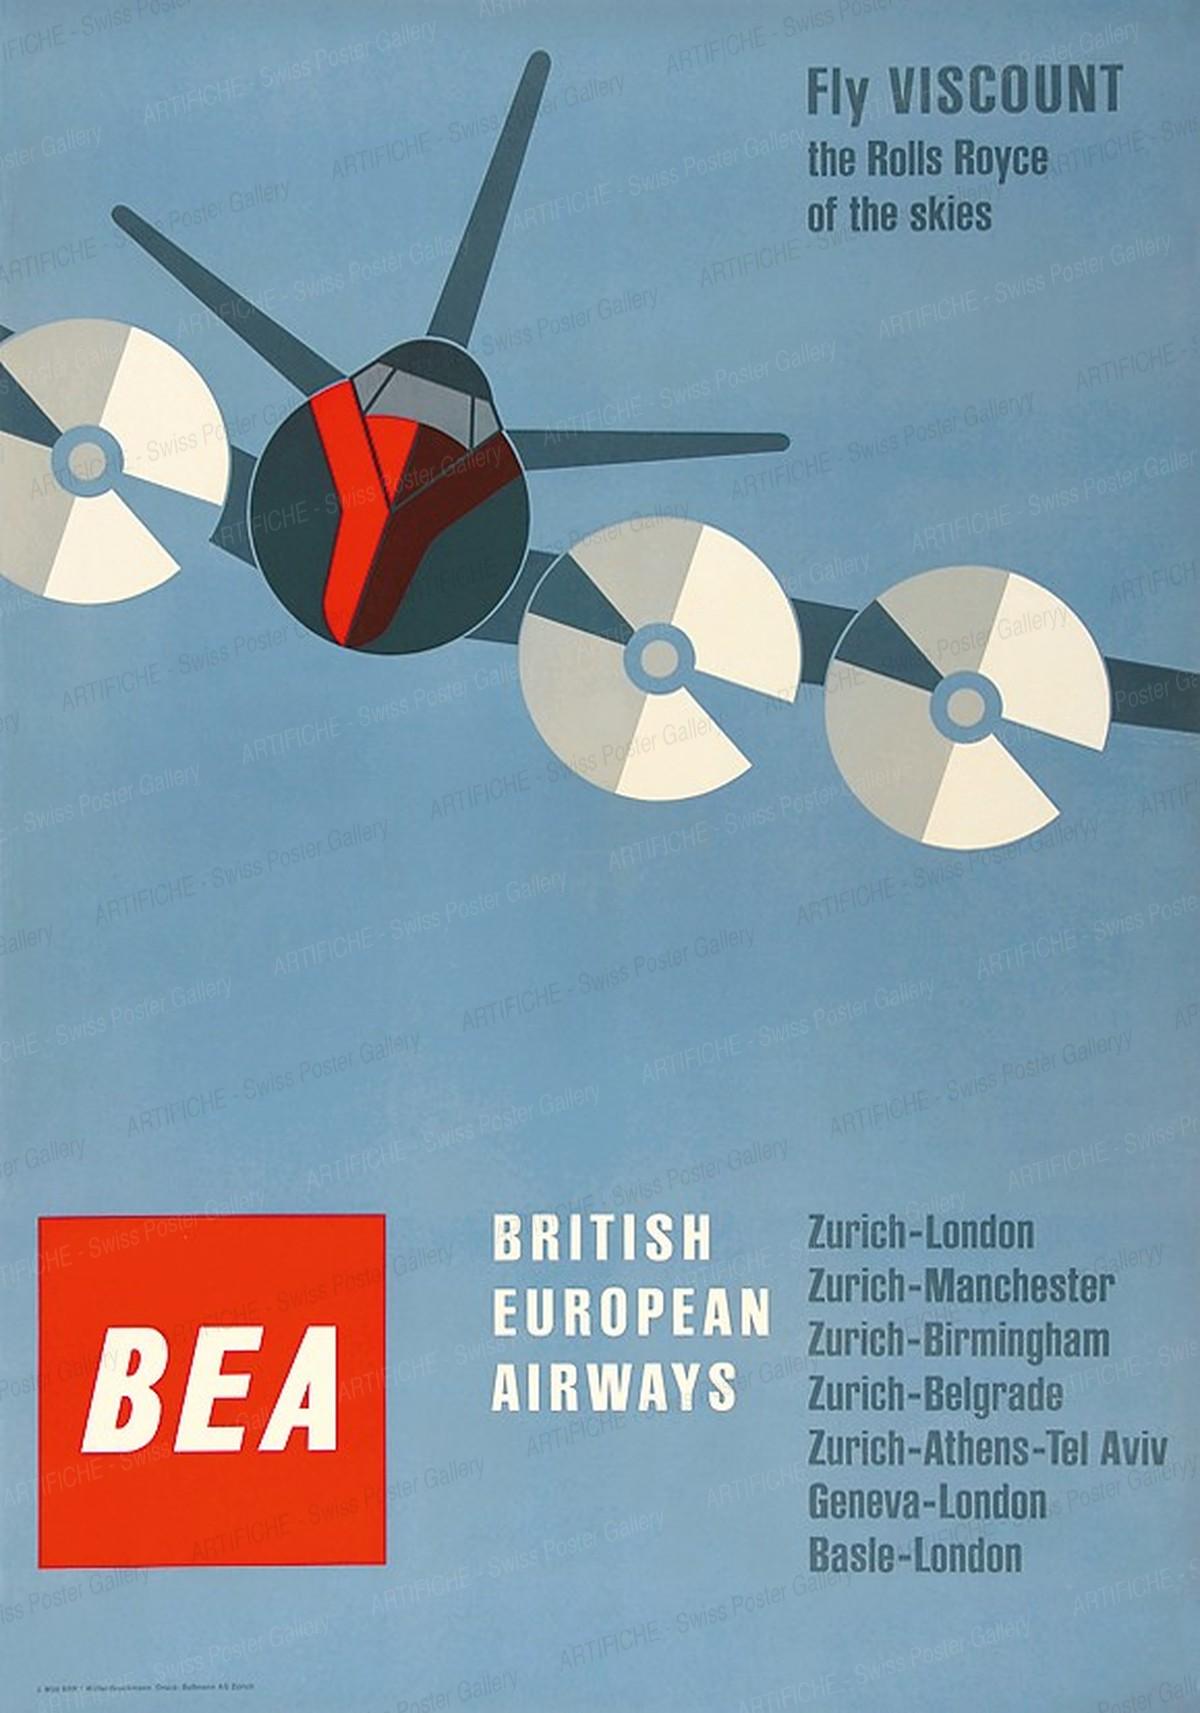 BEA – British Europen Airways – Fly Viscount – The Rolls Royce of the skies, Josef Müller-Brockmann